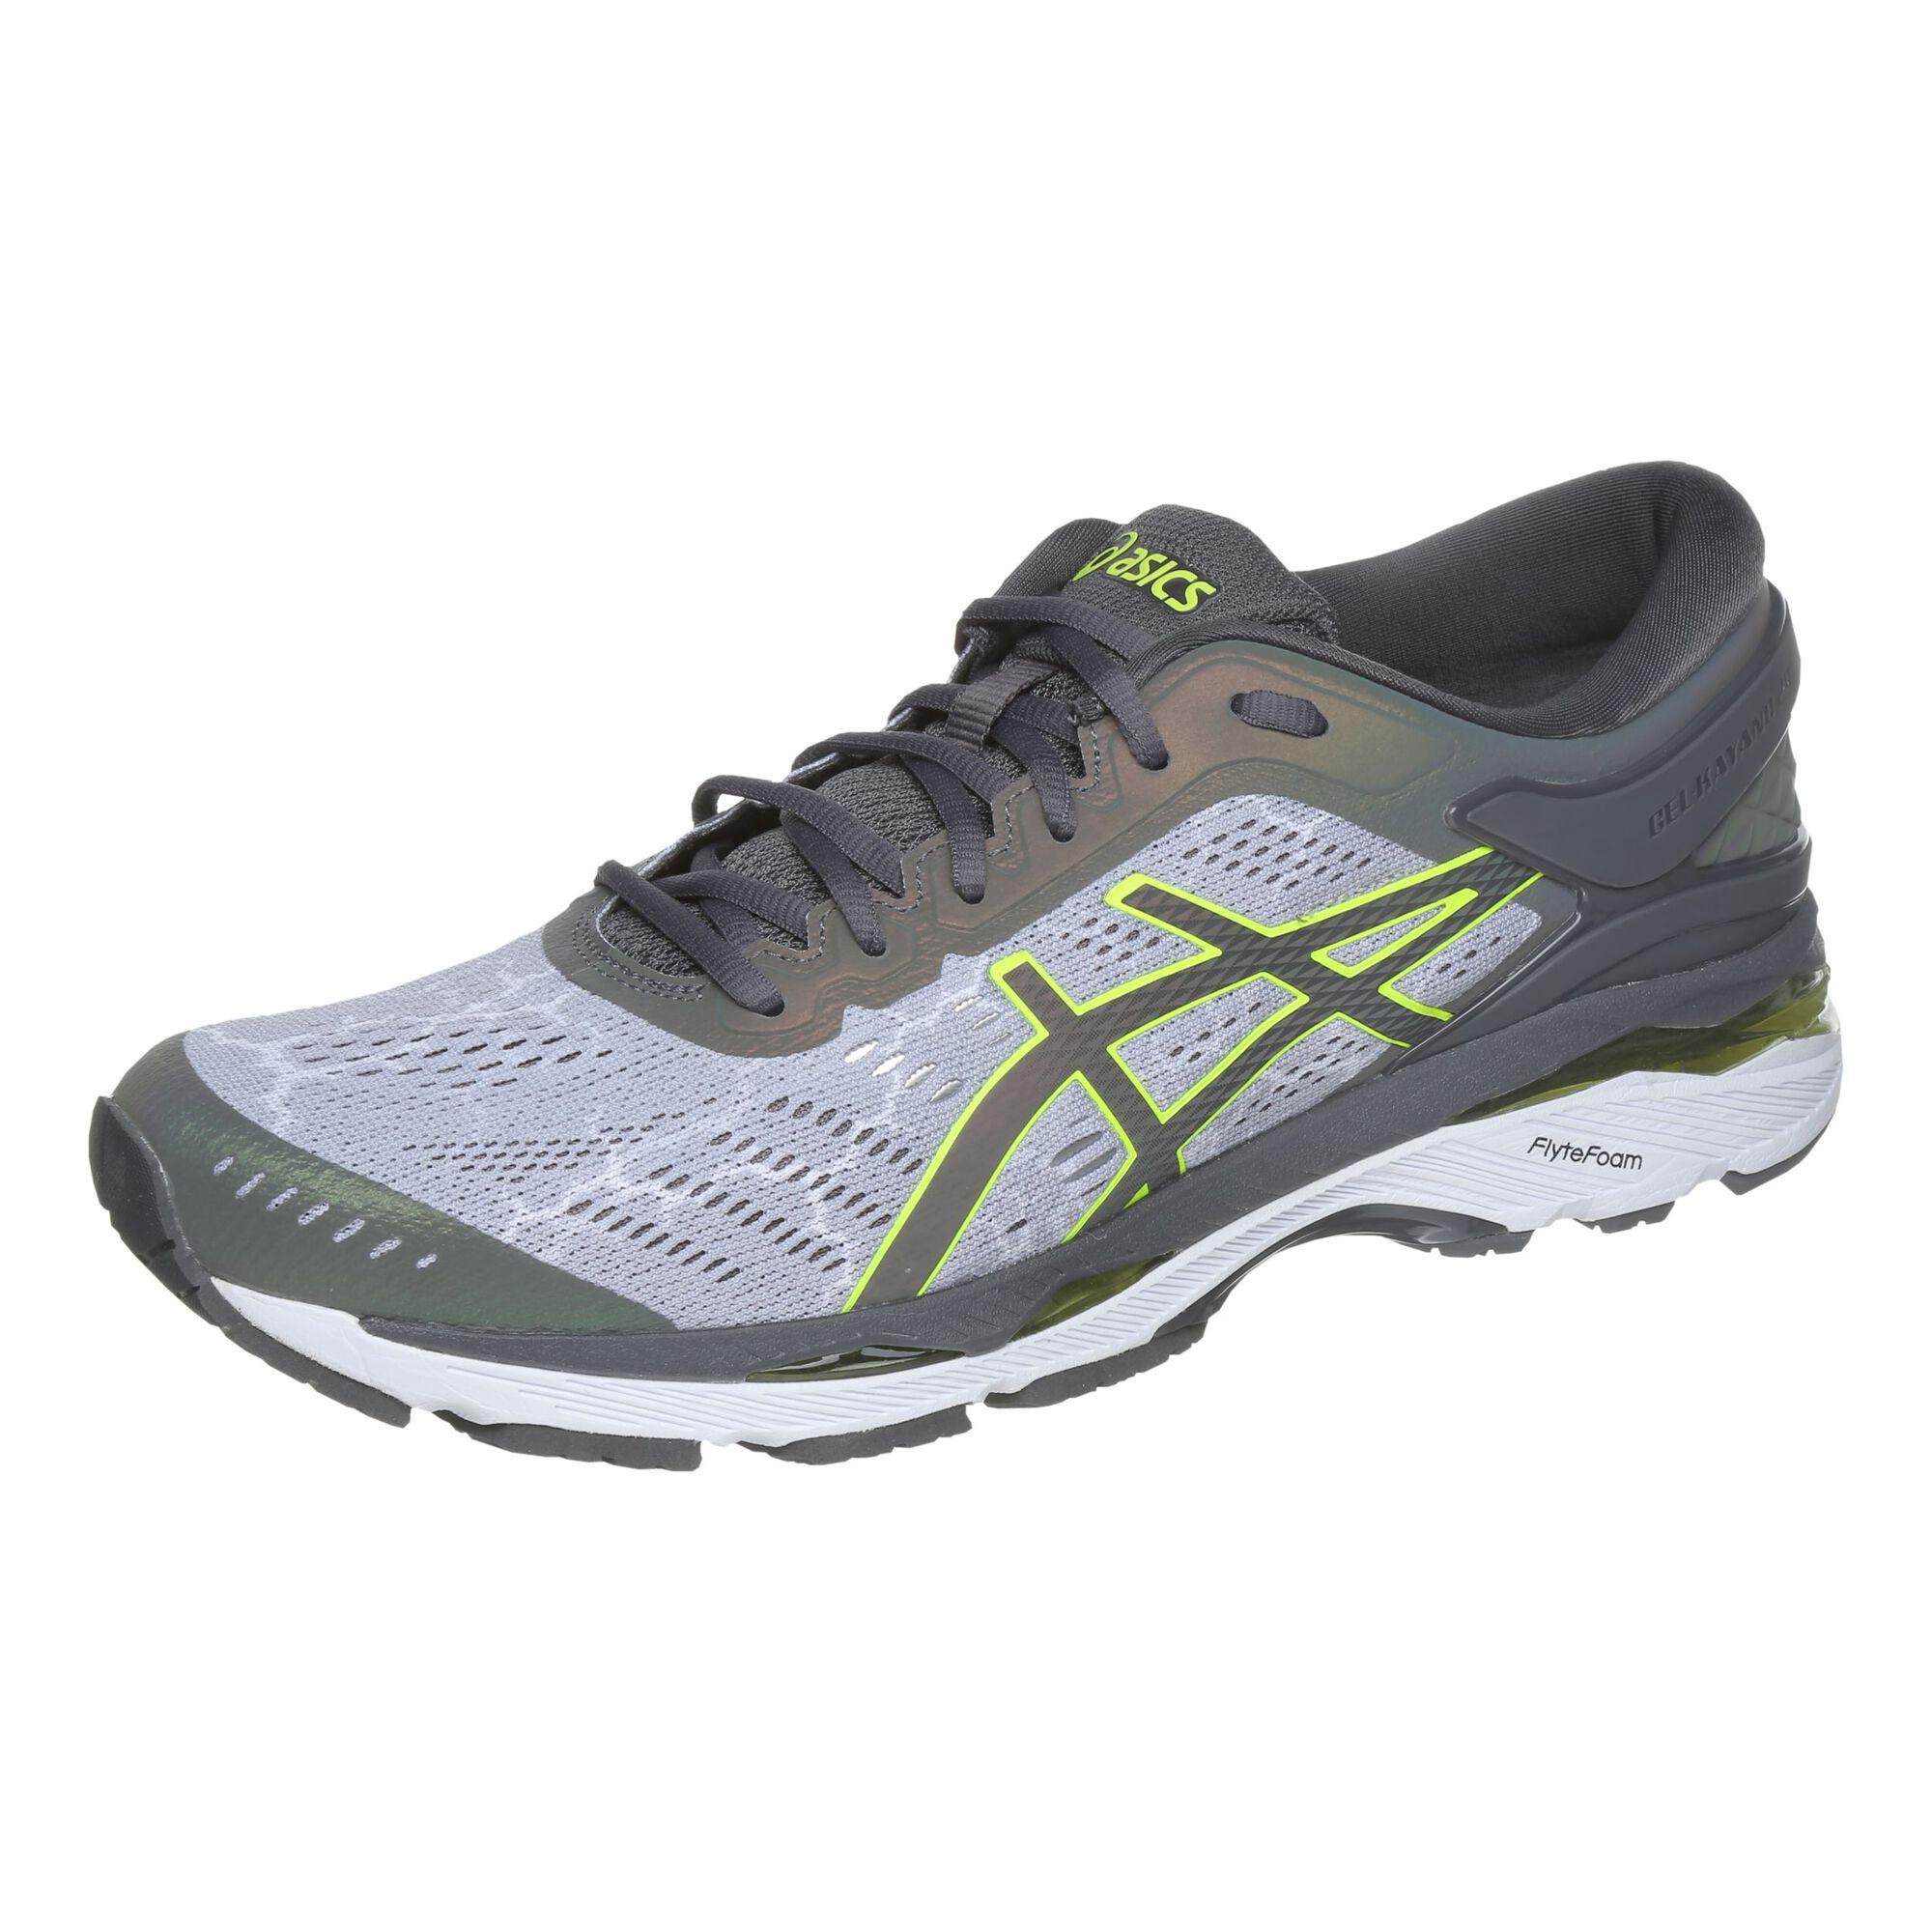 ac88d60e3381 buy Asics Gel-Kayano 24 Lite-Show Stability Running Shoe Men - Dark ...